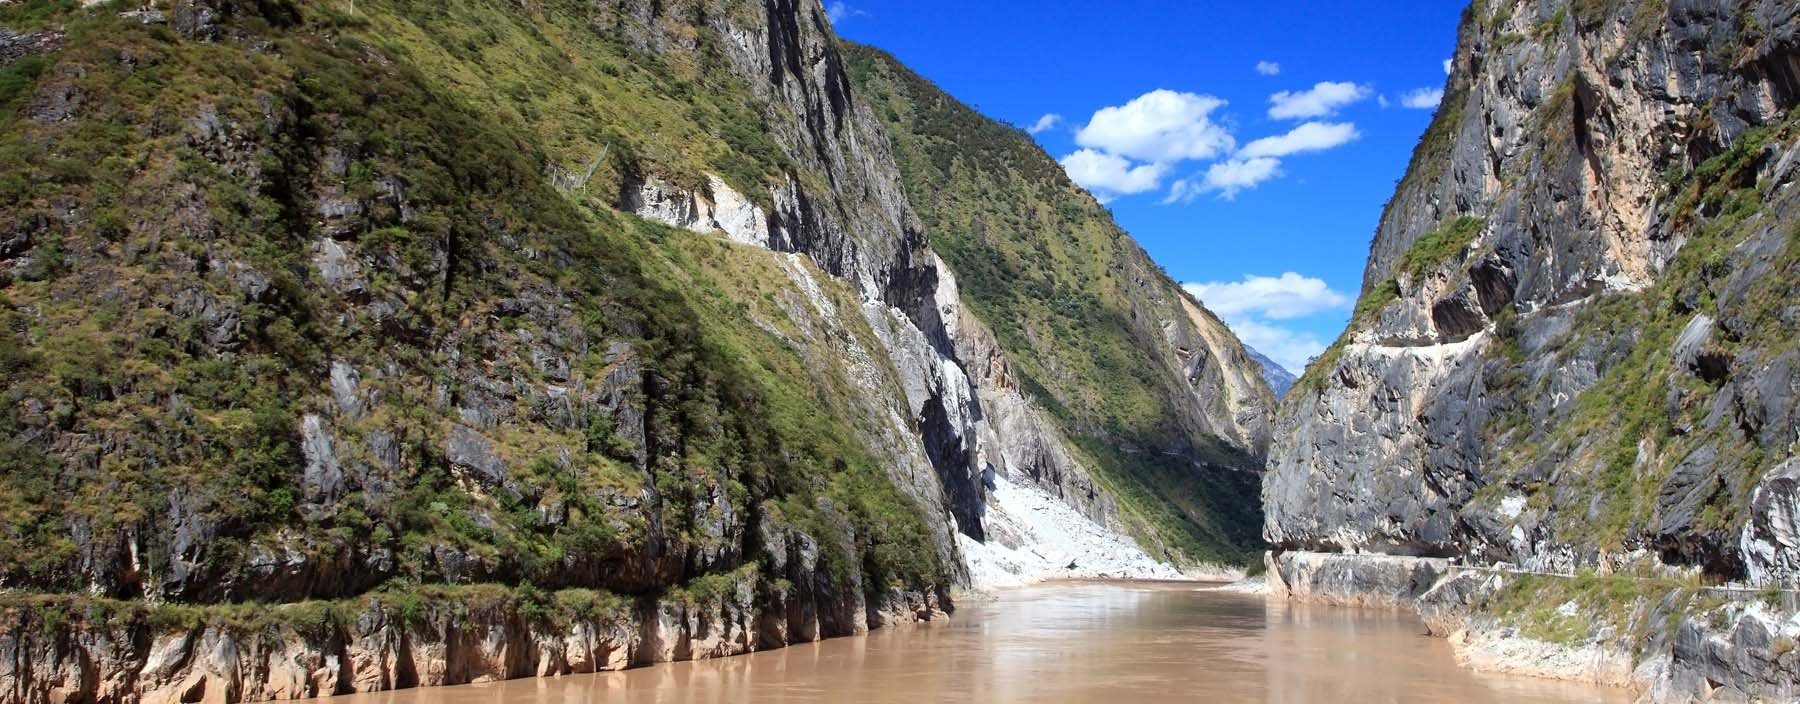 cn, lijiang, tiger leaping gorge (5).jpg